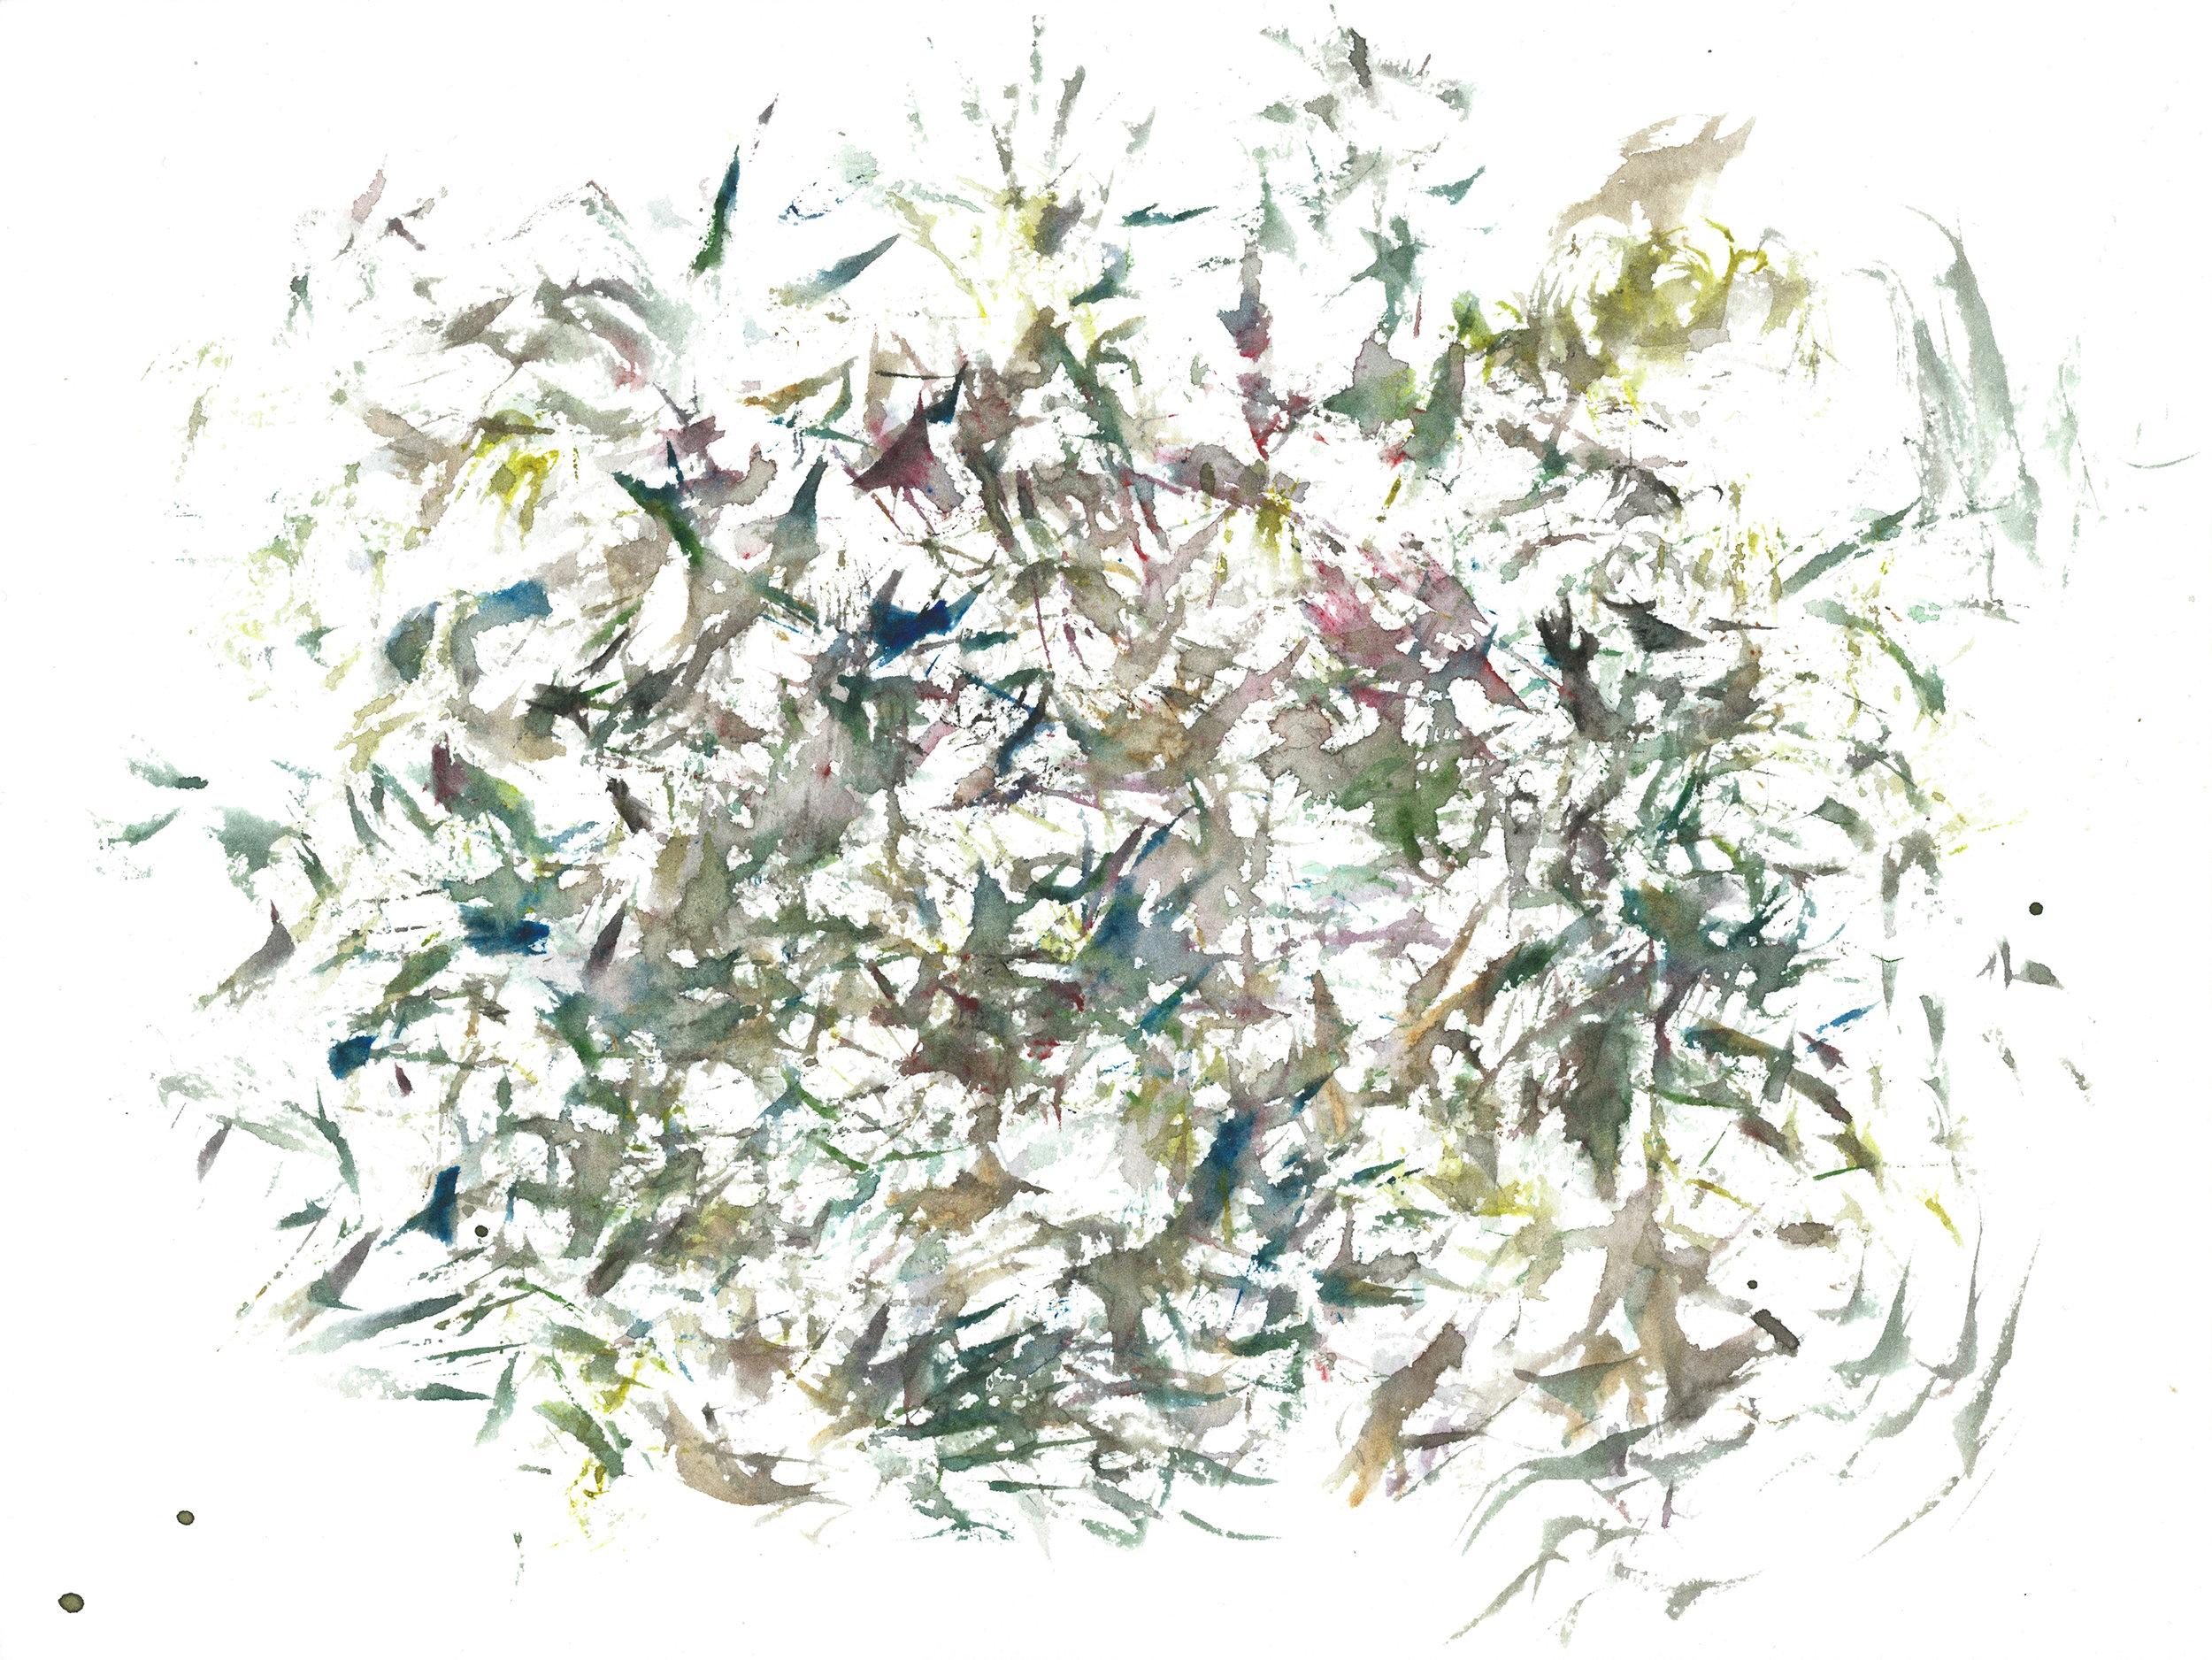 Stephen Thomas, Yoga, Yoga-Svarupa_watercolor_07_k.jpg